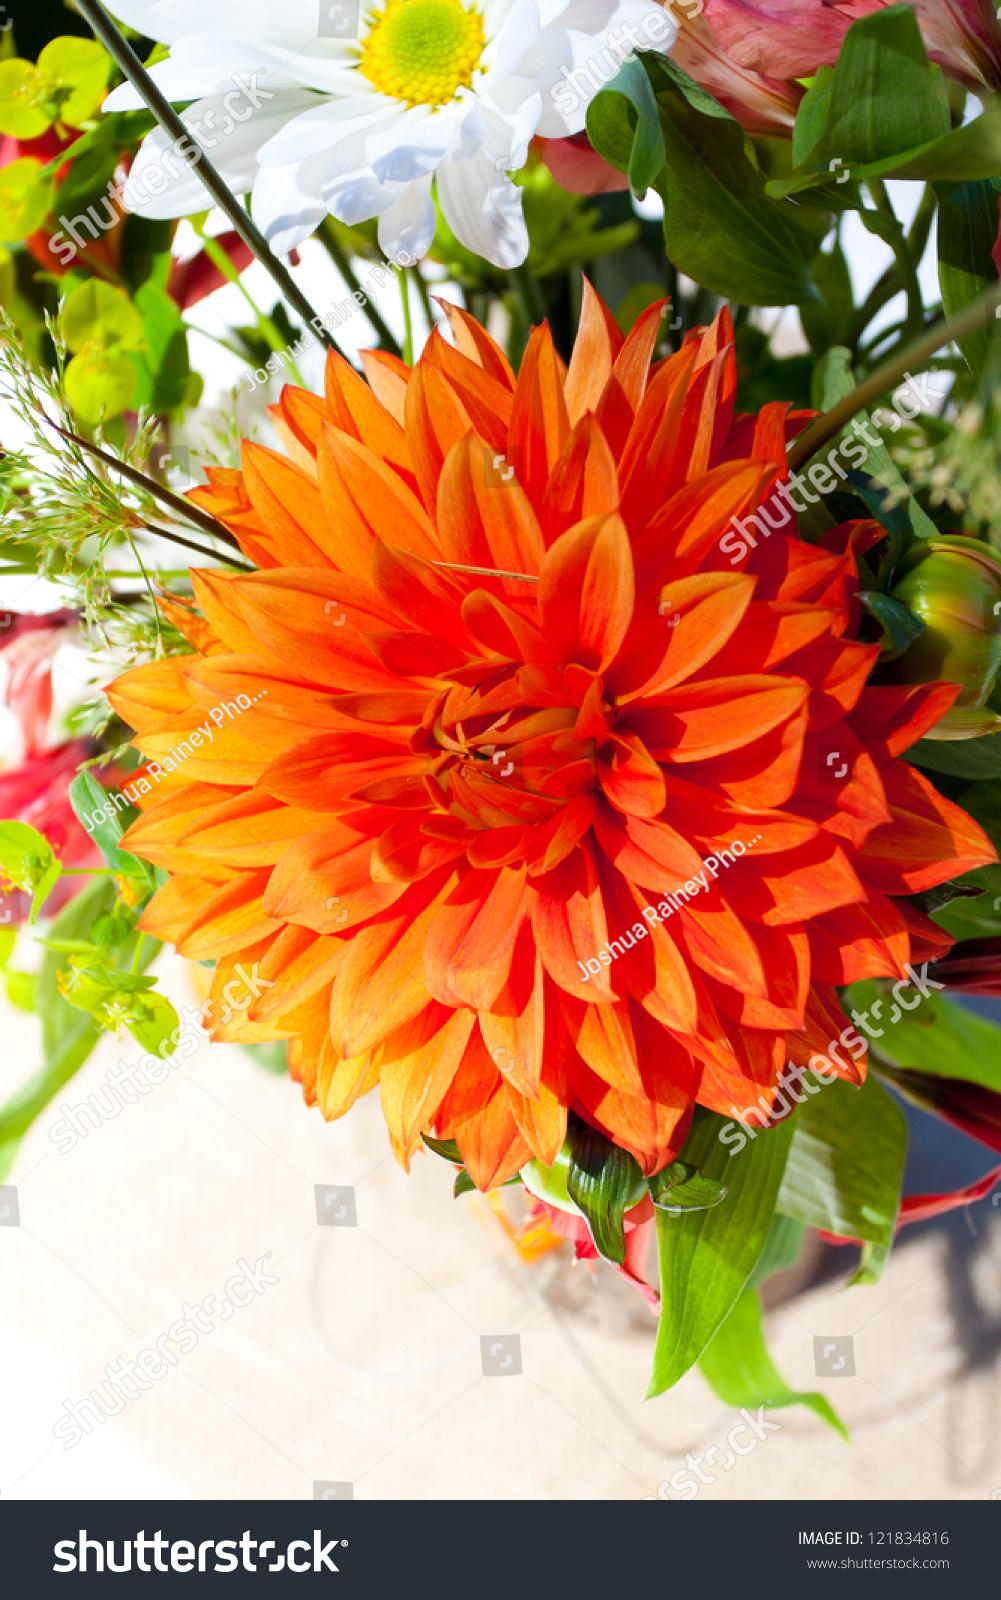 White Orange Green Wedding Flower Arrangements Stock Photo 100